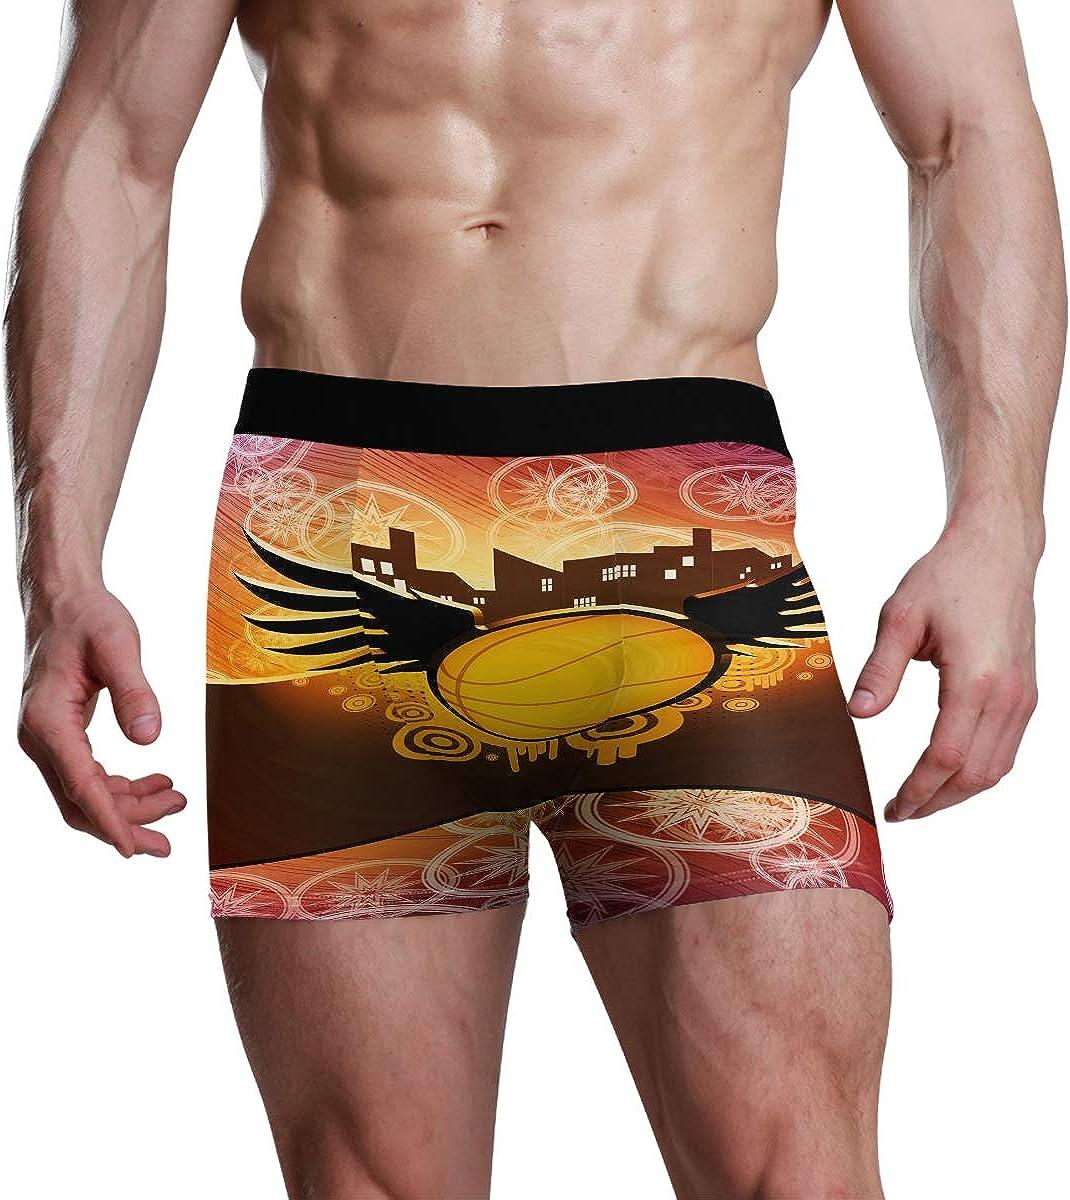 HangWang Mens Boxer Briefs Underwear Cool Basketball with Wings Trunks Underwear Short Leg Boys